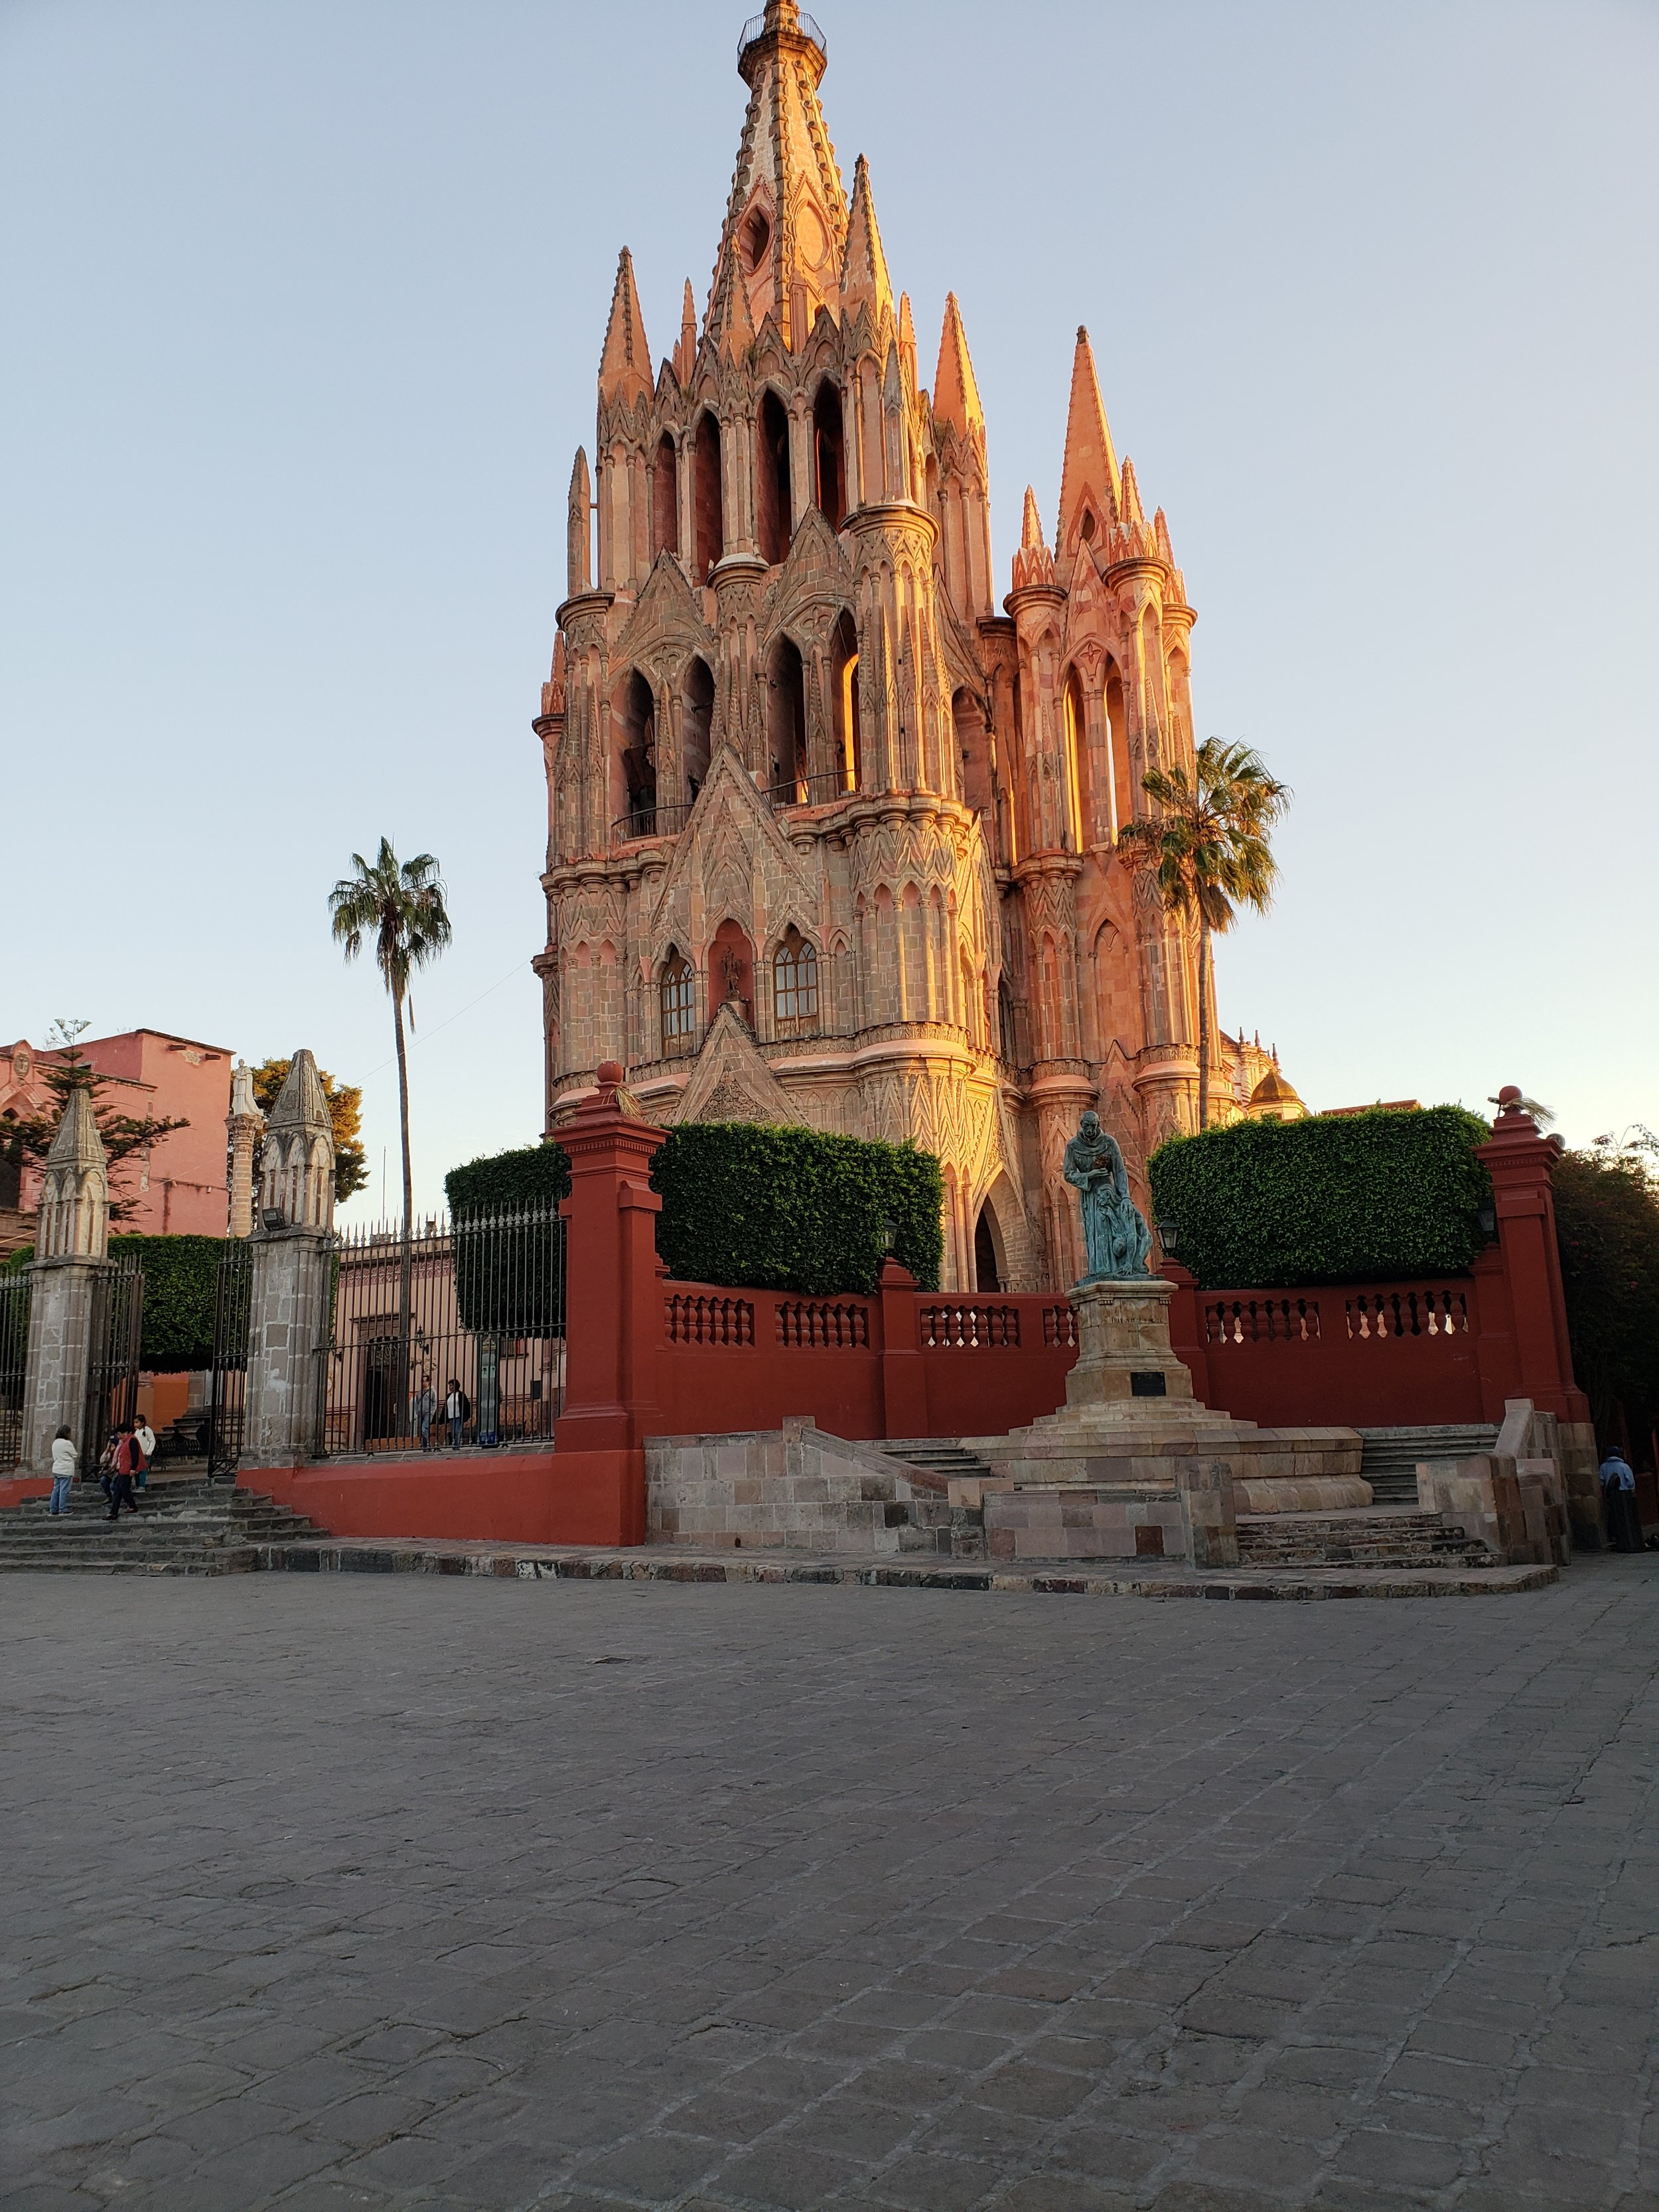 Church in main square of San Miguel de Allende